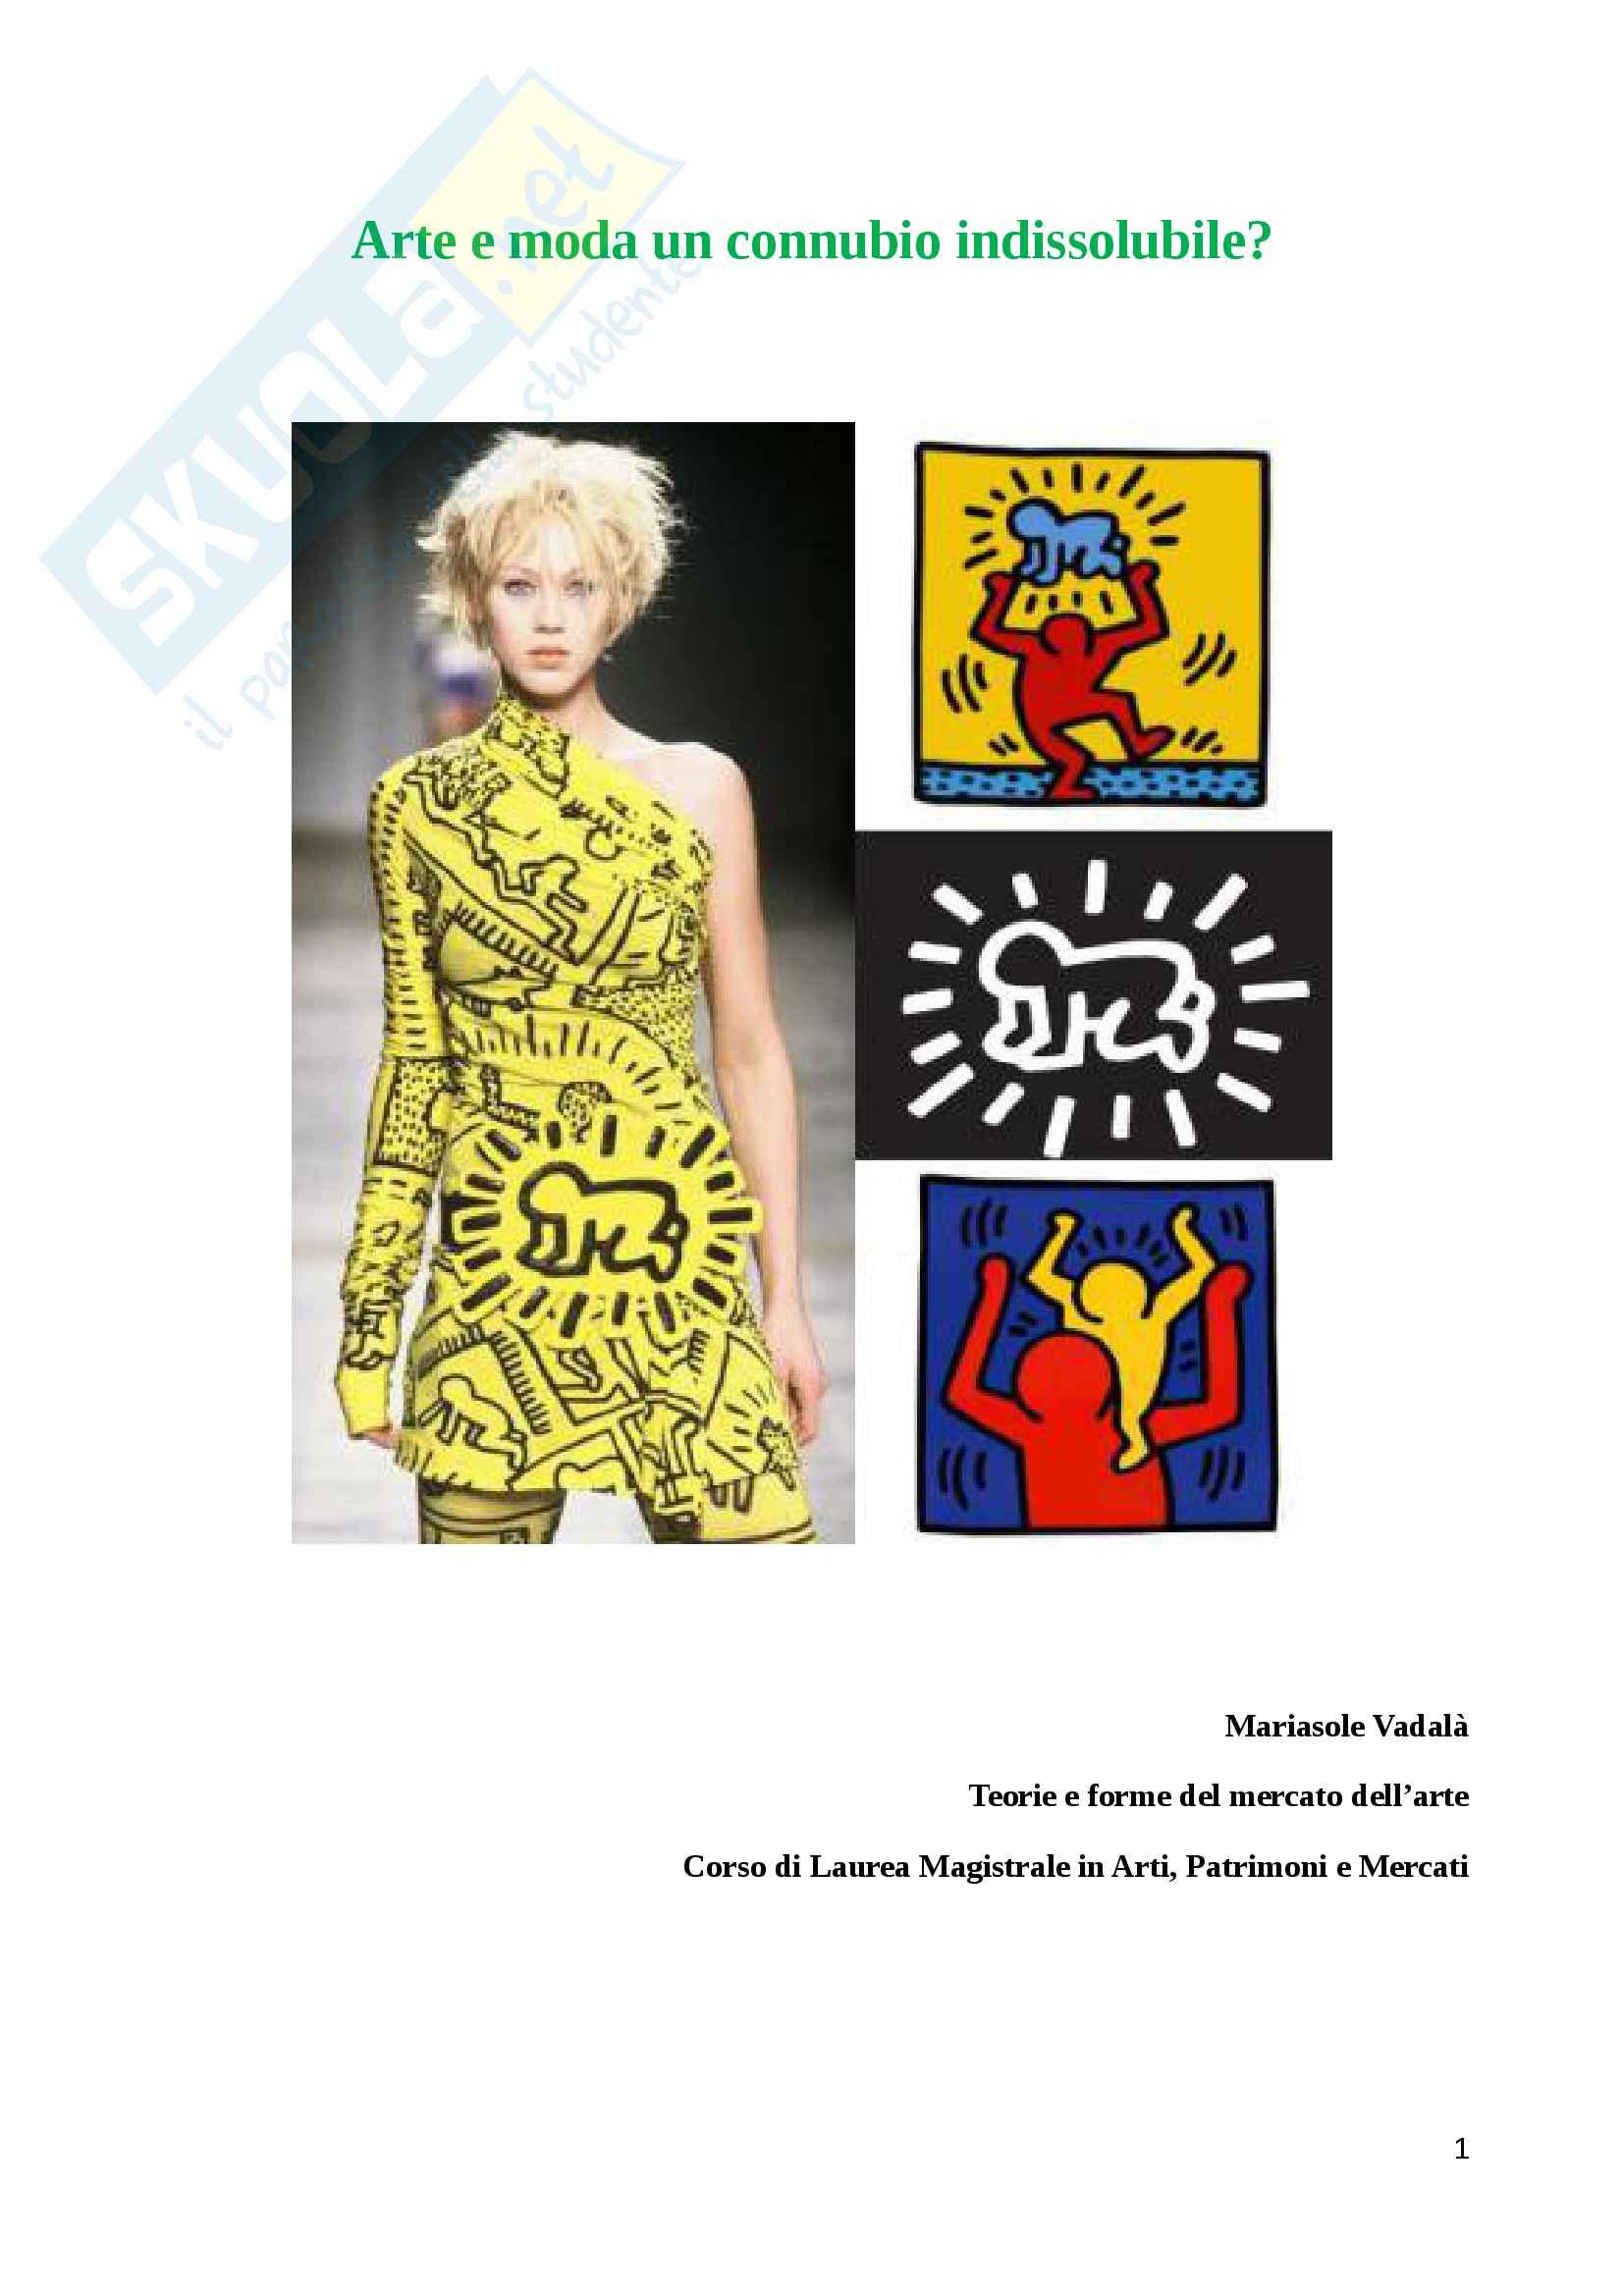 Tesina d'esame: Arte e moda un connubio indissolubile?